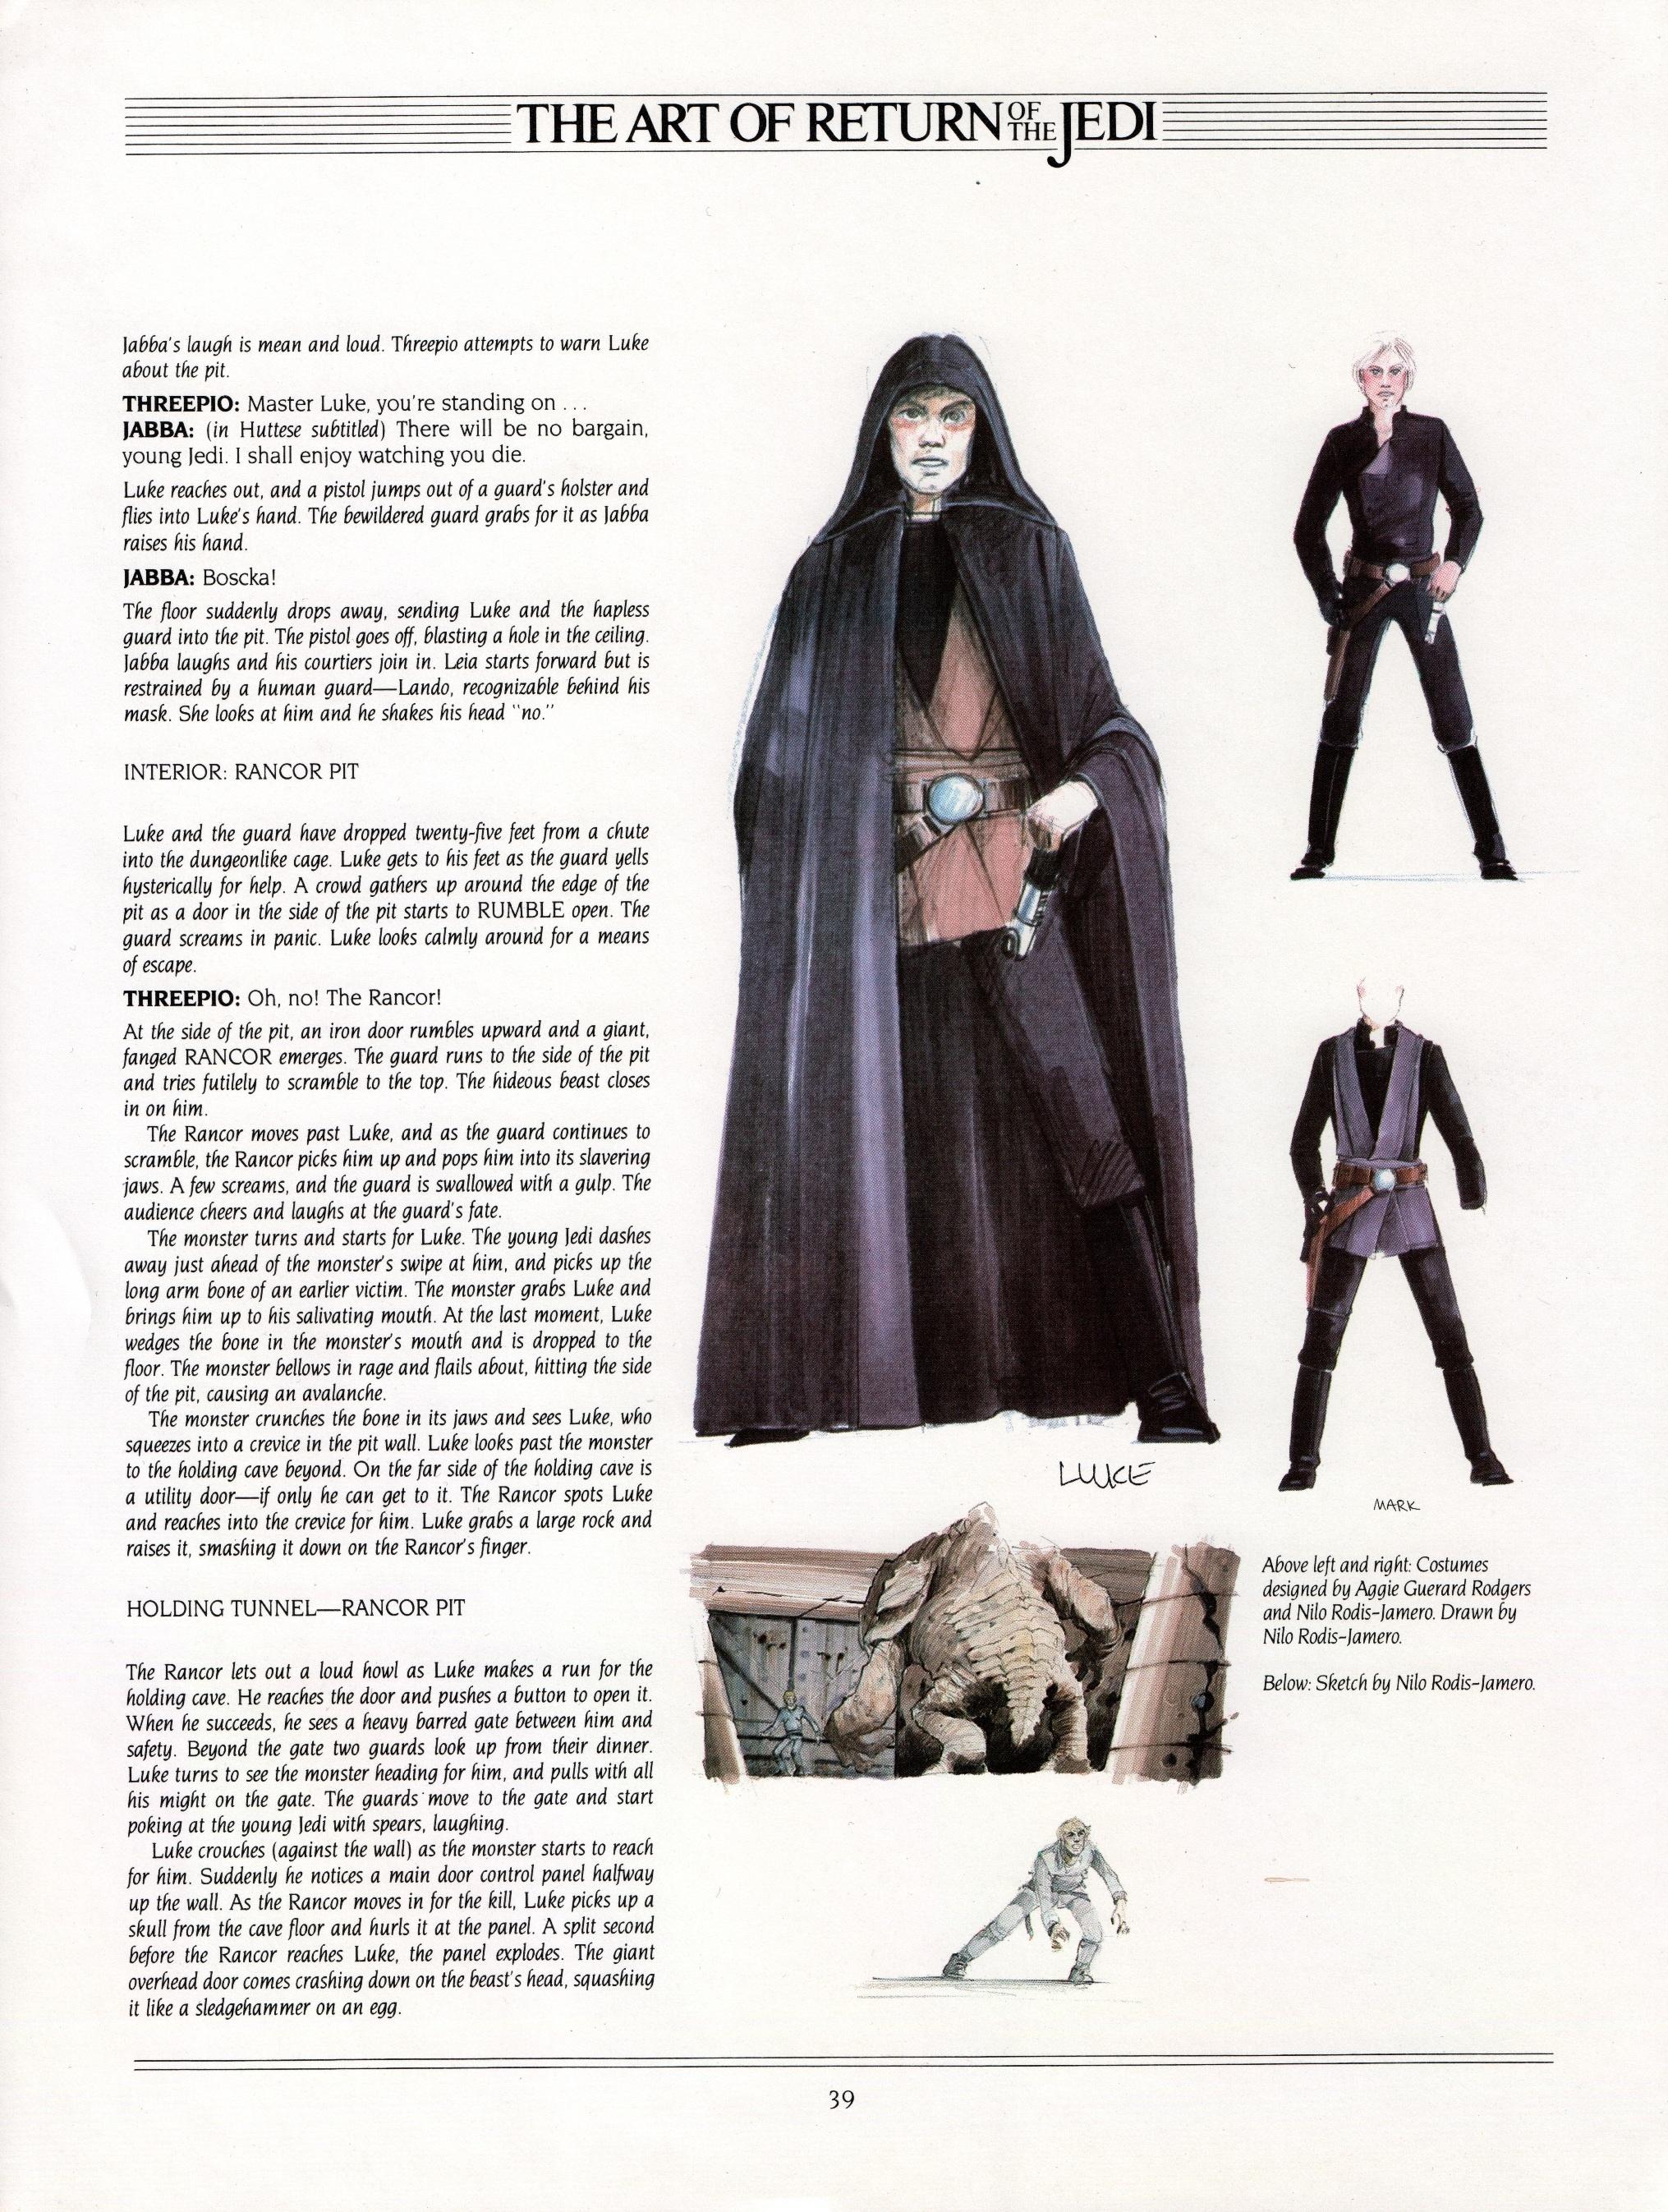 Art of Return of the Jedi (b0bafett_Empire)-p039